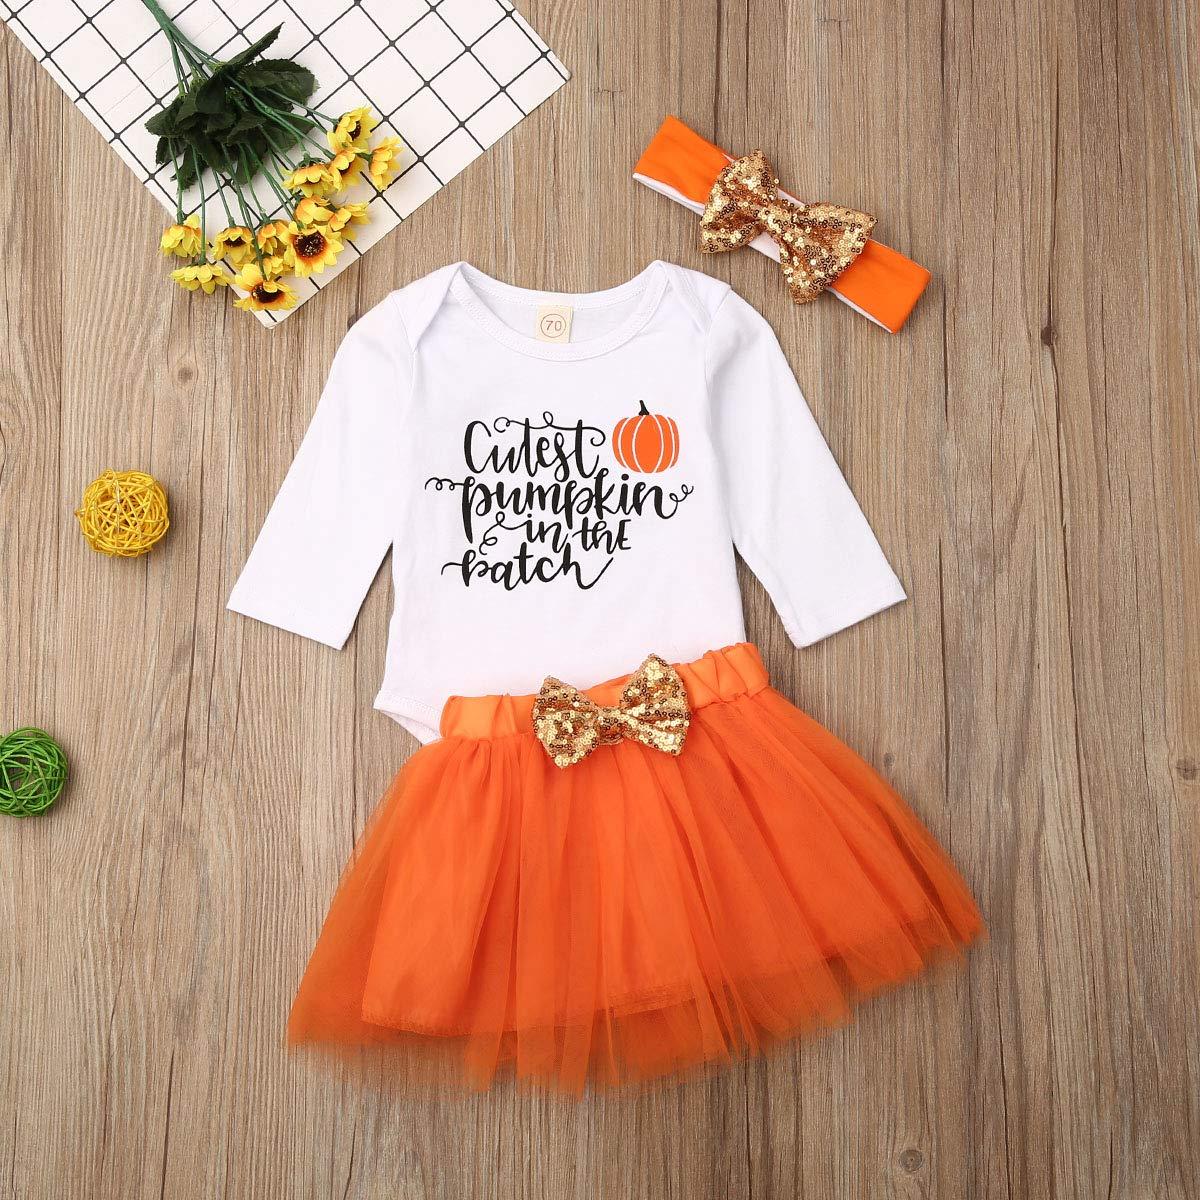 Kosusanill Newborn Baby Girl Halloween Costume Pumpkin in The Patch Romper Bodysuit Tutu Skirt Headband Outfit Set 0-12M